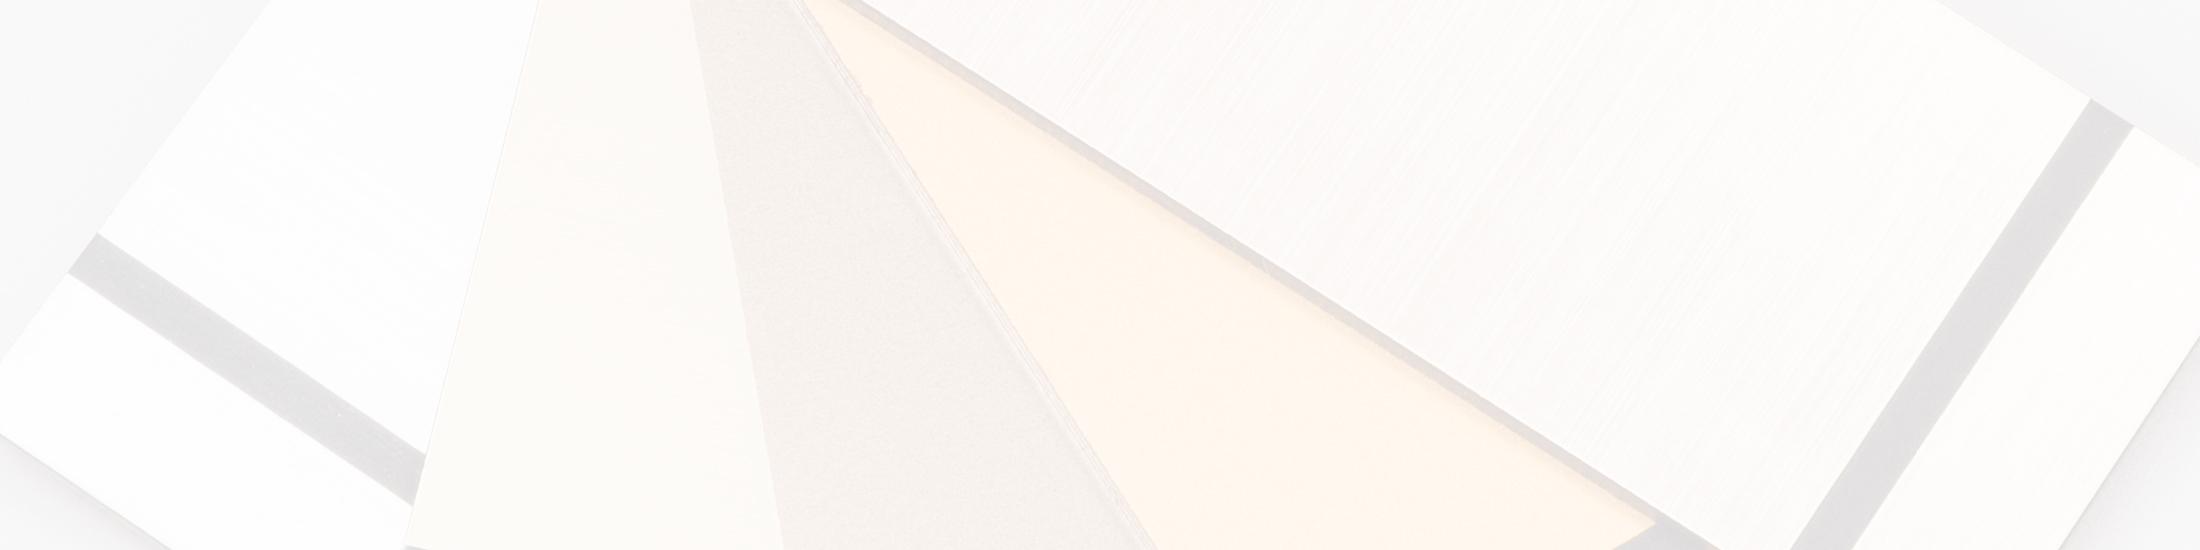 Gravurmaterial TroLase Metallic